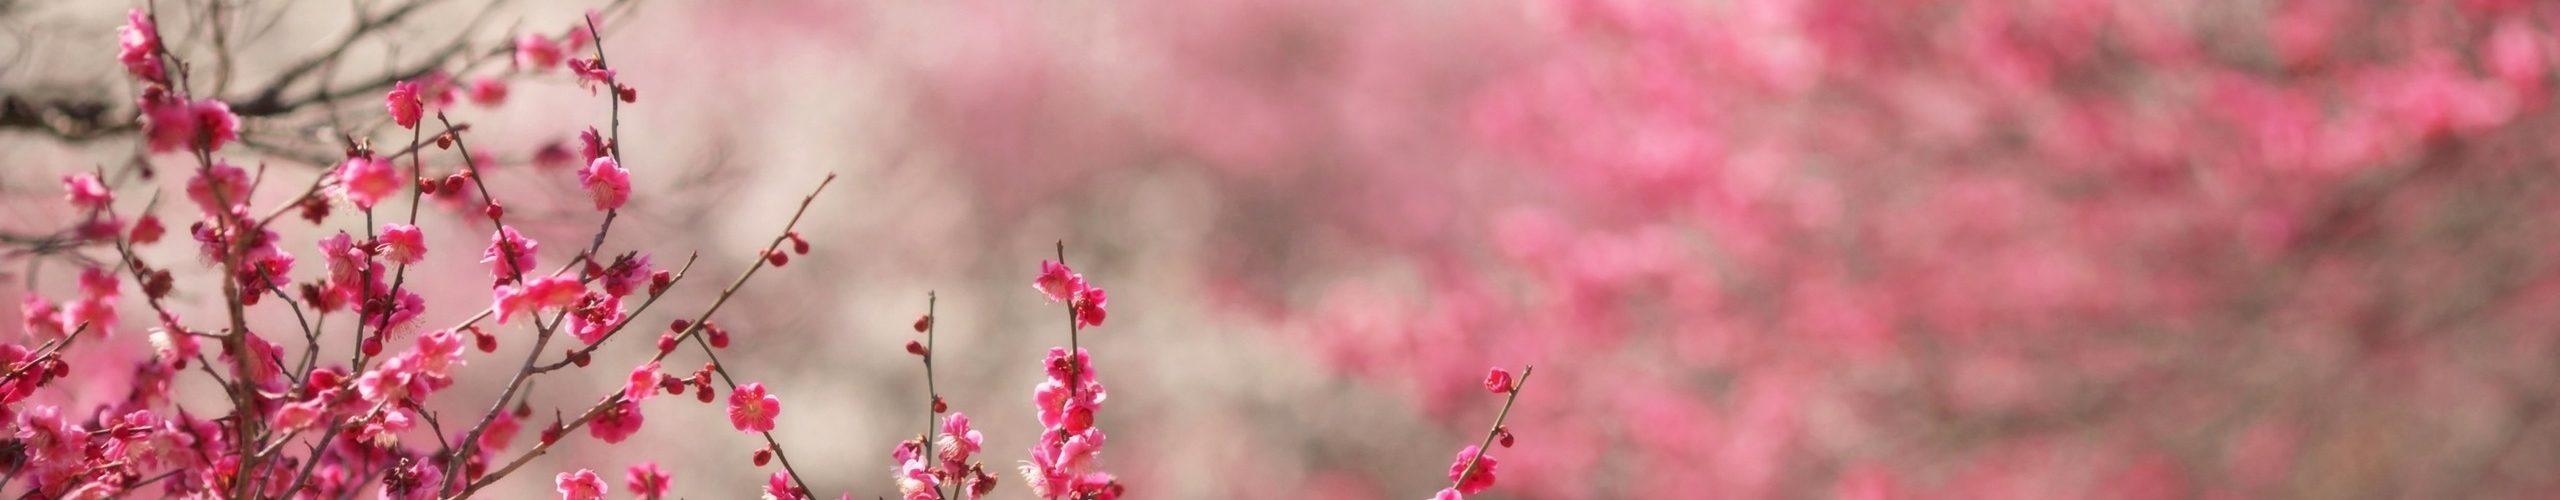 asti primavera